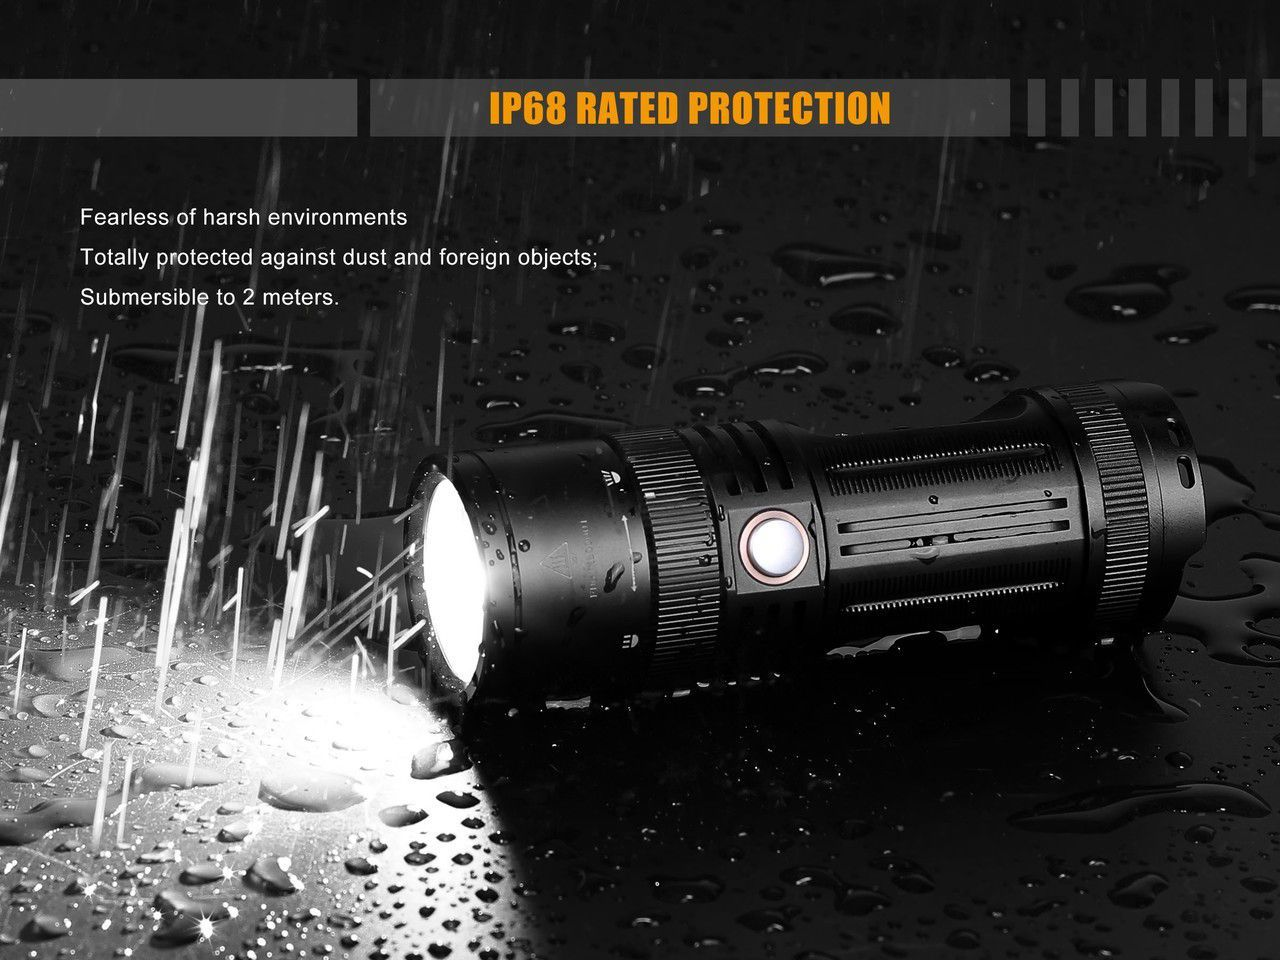 - Lanterna Fenix FD45- Foco ajustável - 900 Lumens